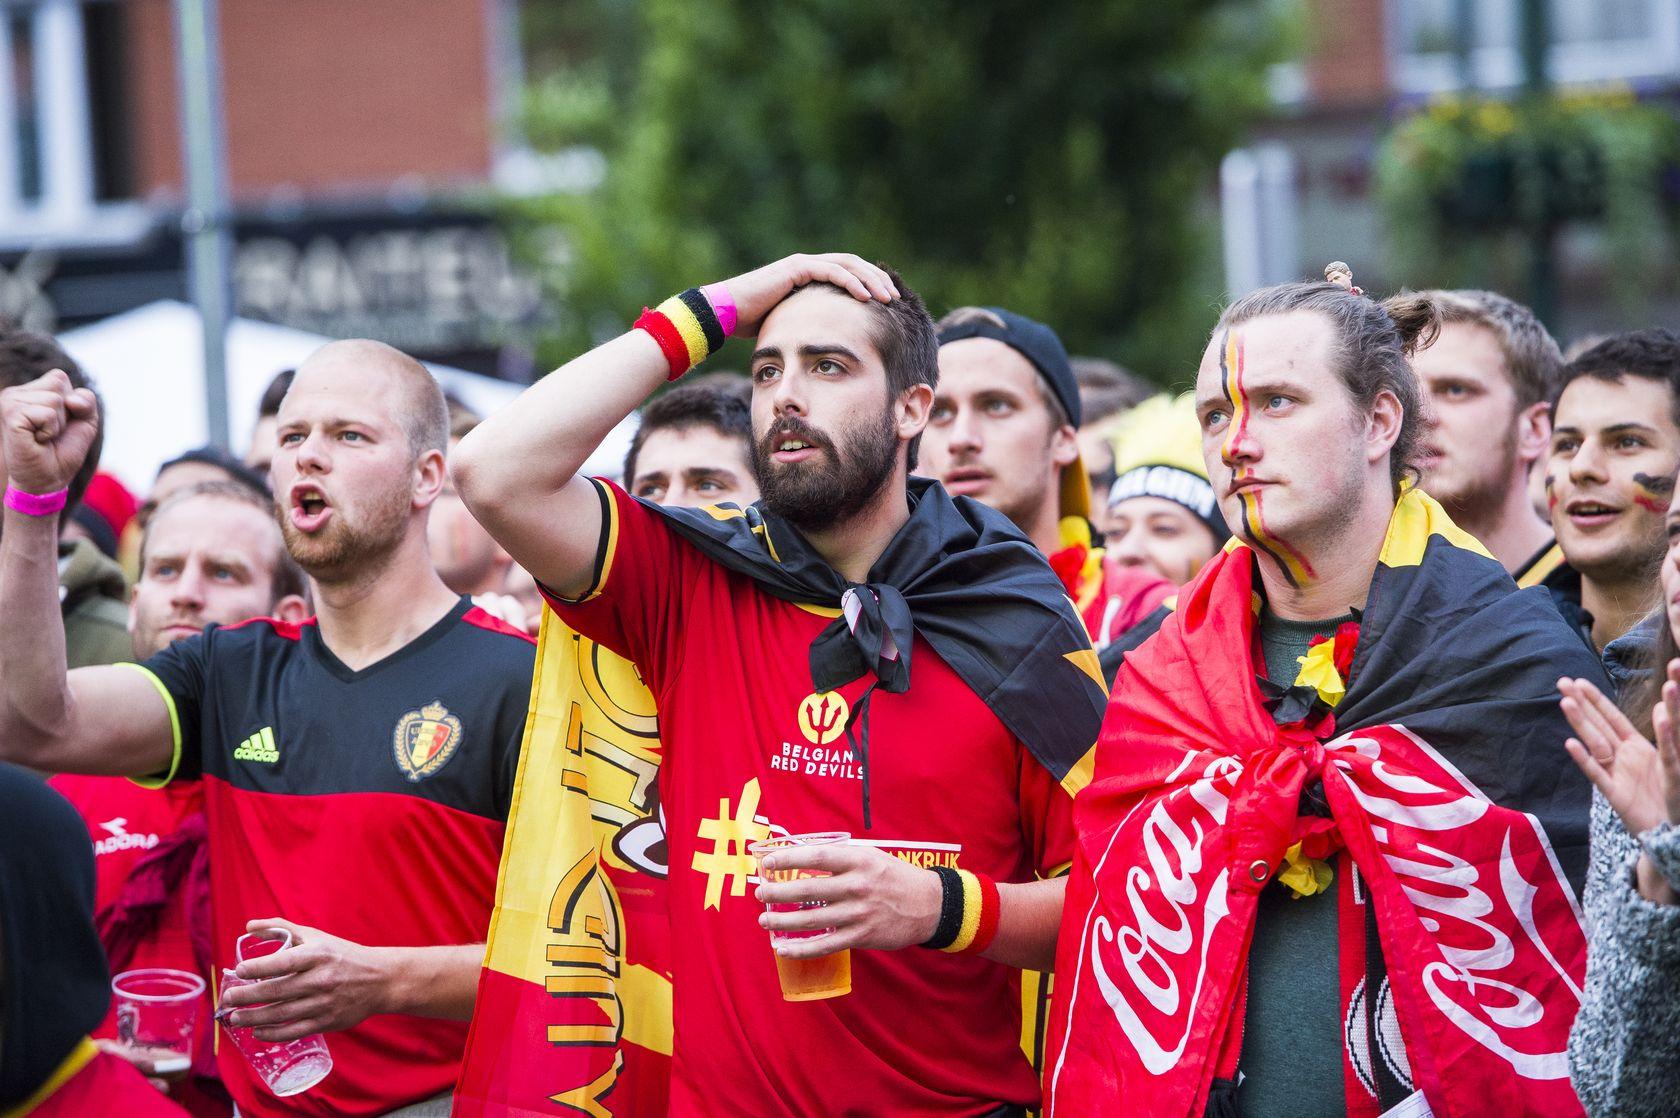 SOCCER EURO 2016 BELGIUM VS ITALY BIG SCREEN